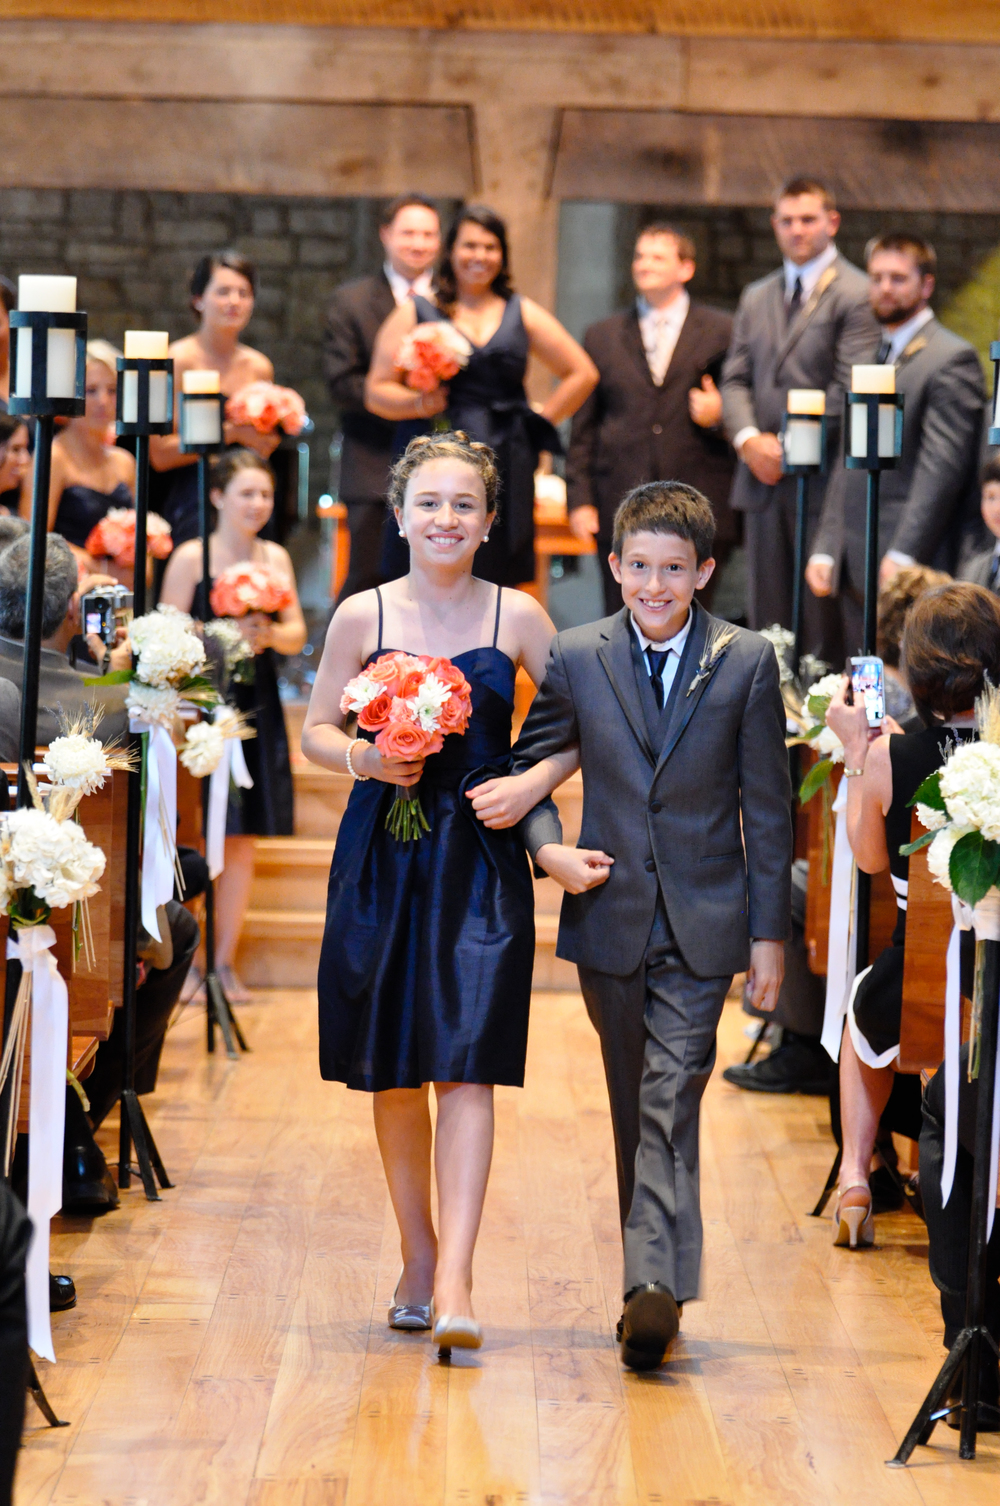 The two junior bridesmaids and two groomsmen were pretty precious.